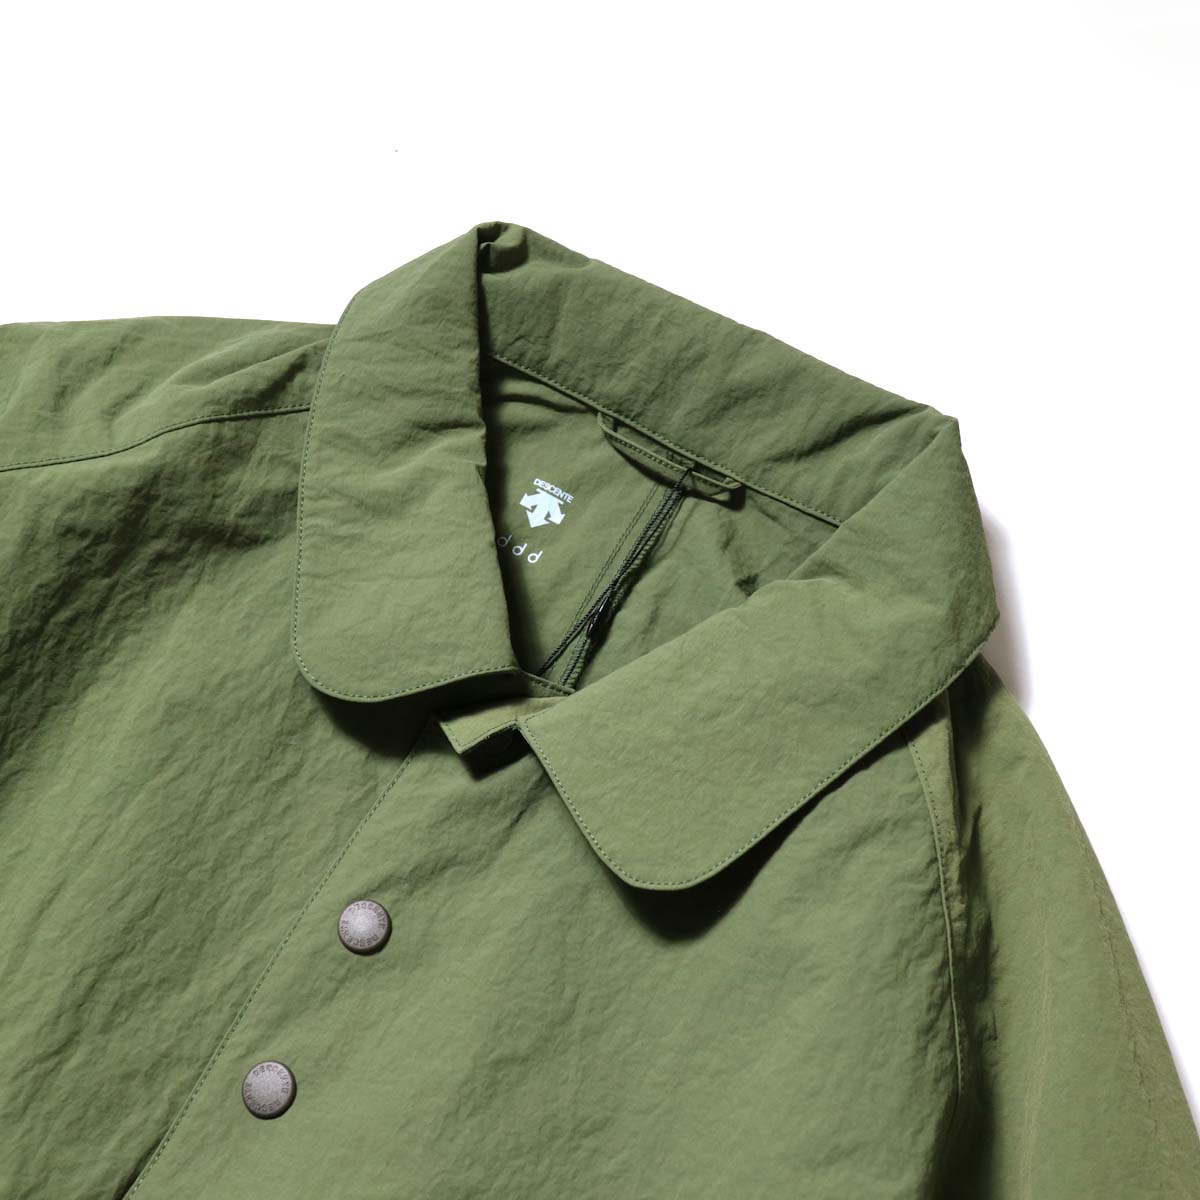 DESCENTE ddd / SWING COACH JACKET (Khaki)襟